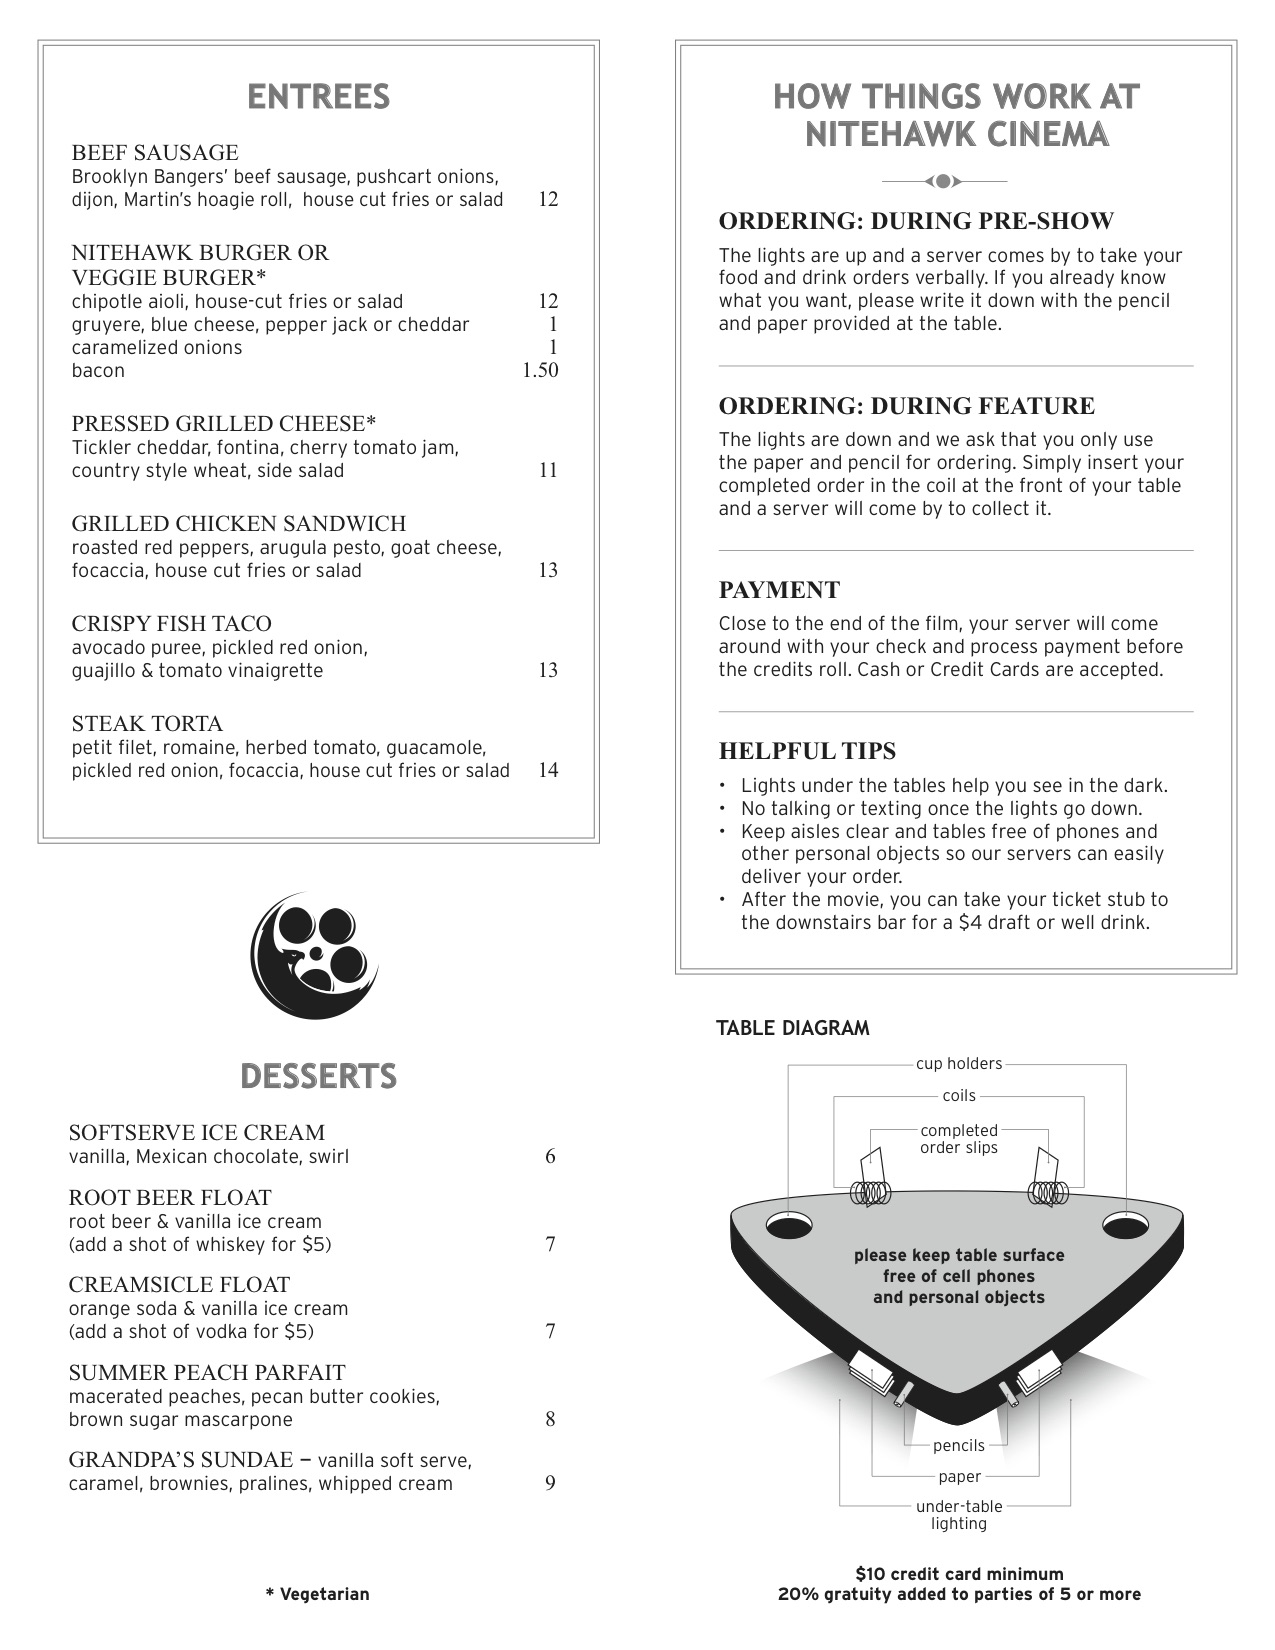 NH_Dinner menu 6.26.15-2